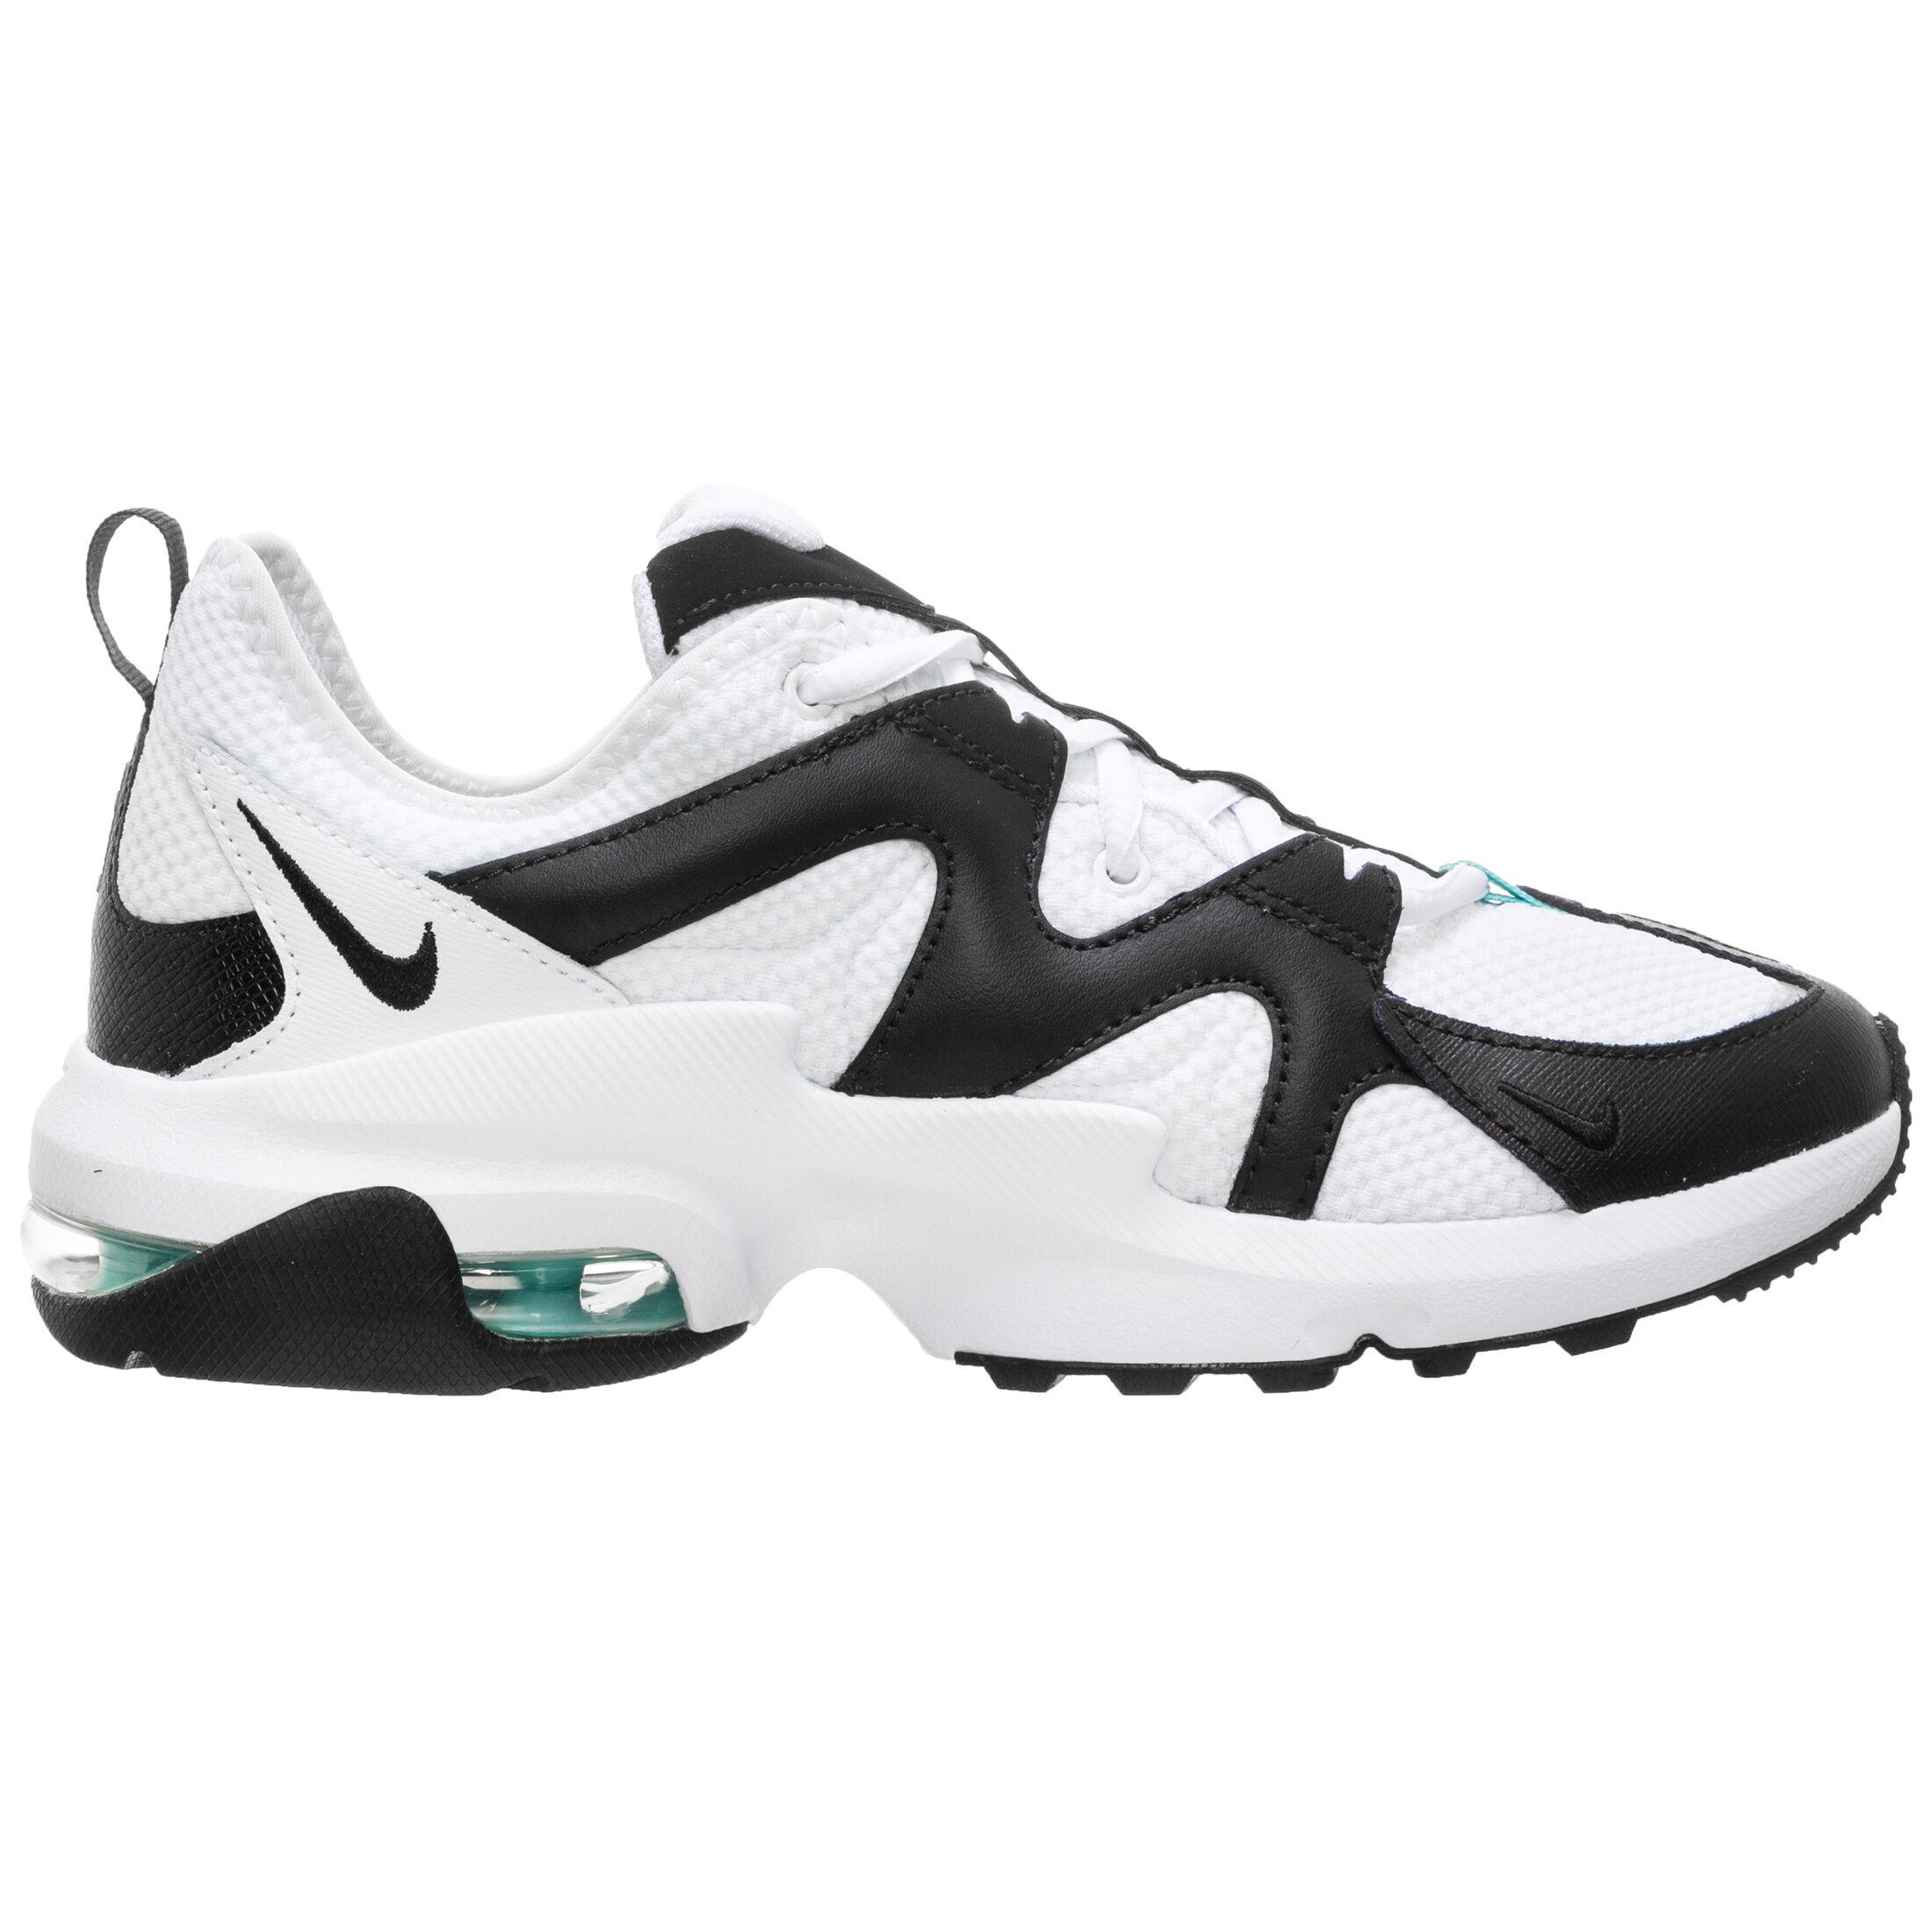 Nike Sportswear Air Max Gravitation Sneaker Damen bei OUTFITTER